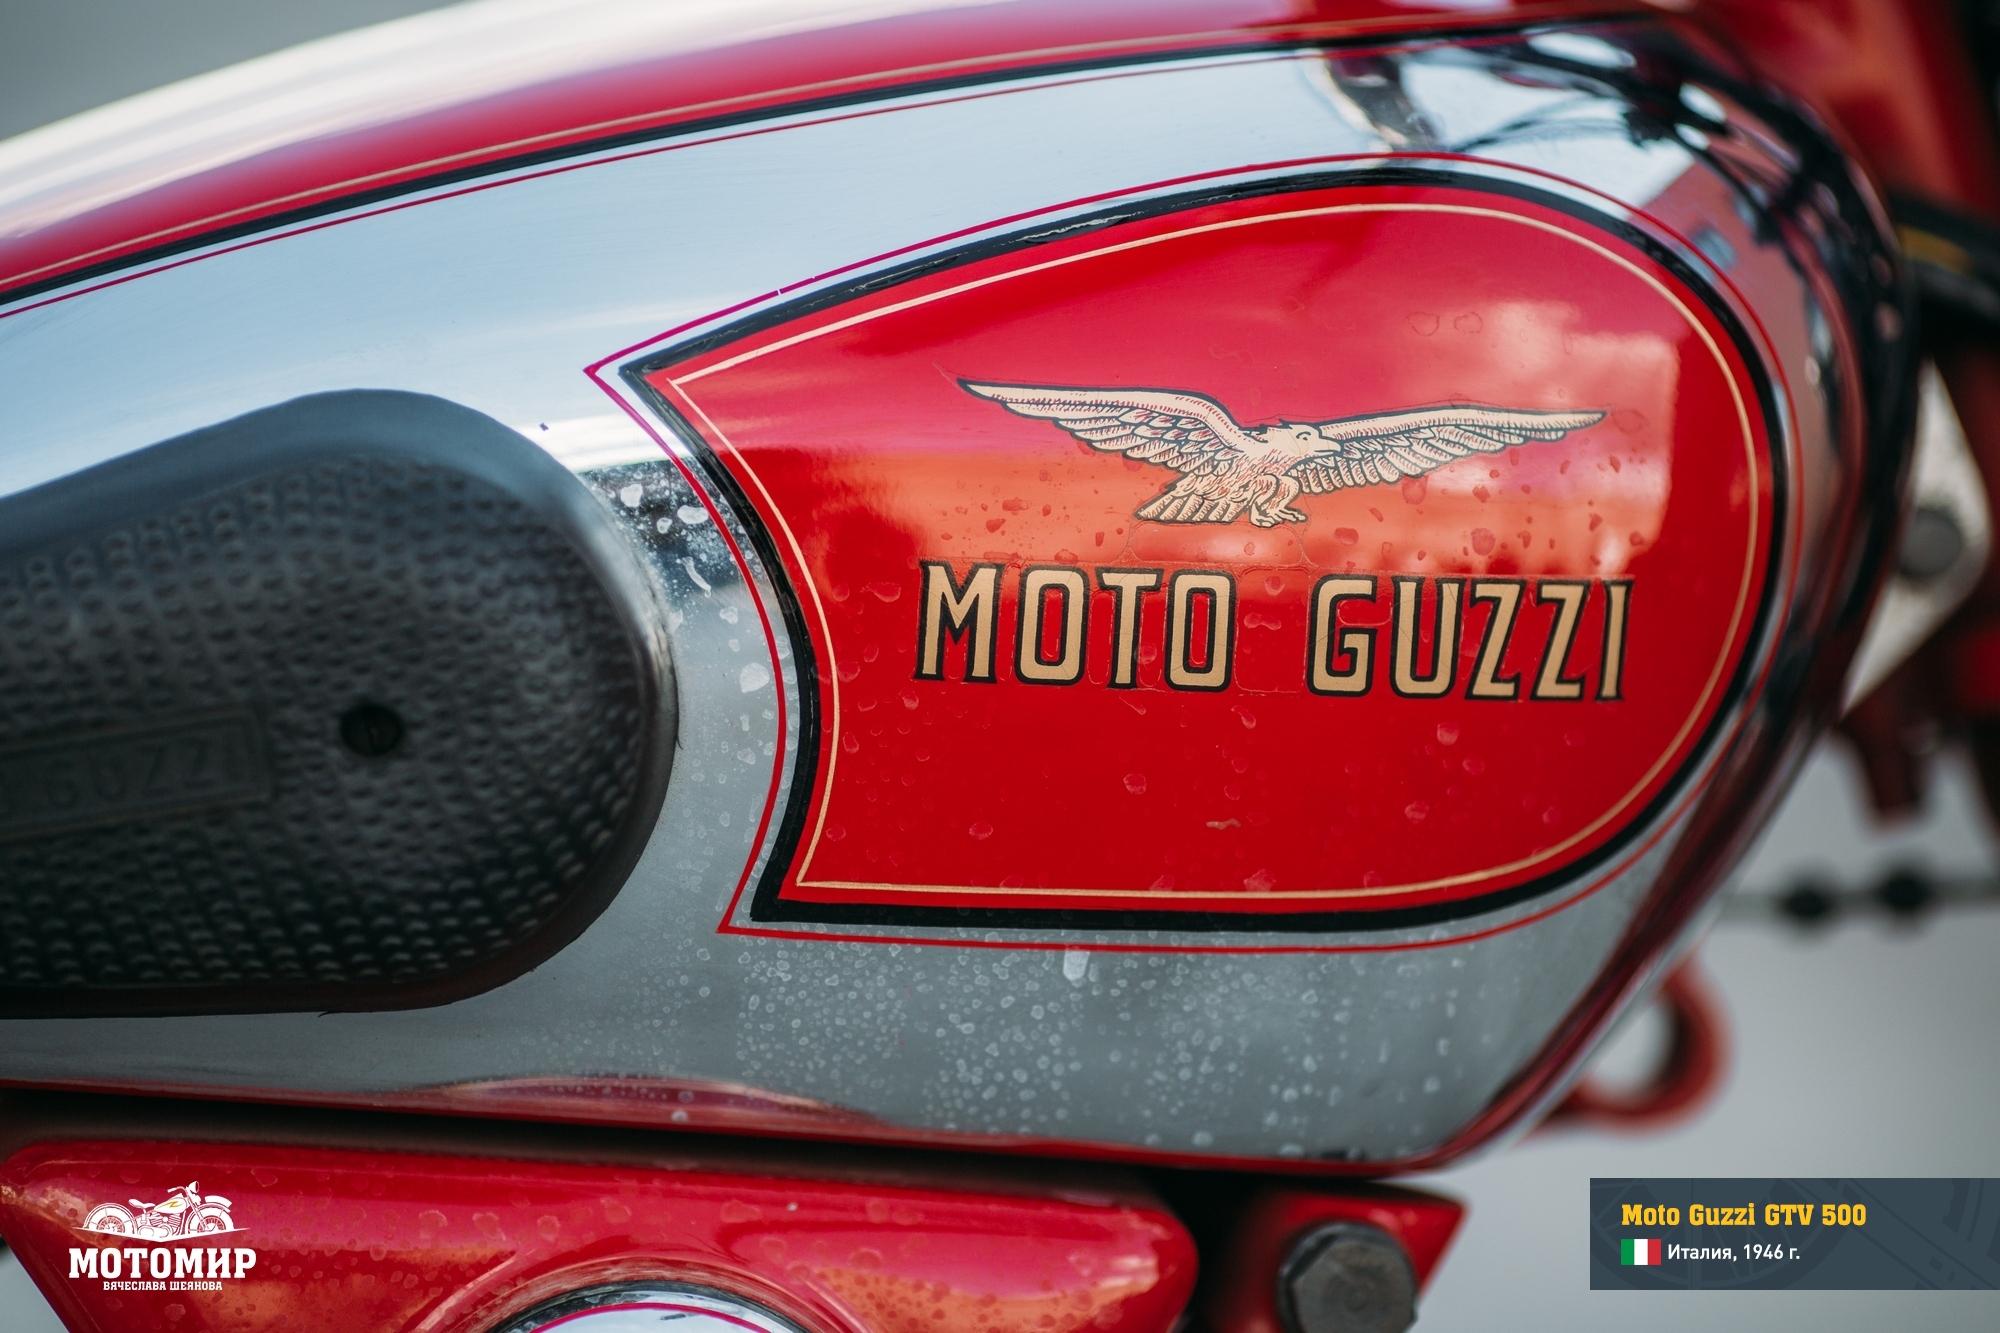 moto-guzzi-gtv-500-201509-web-12